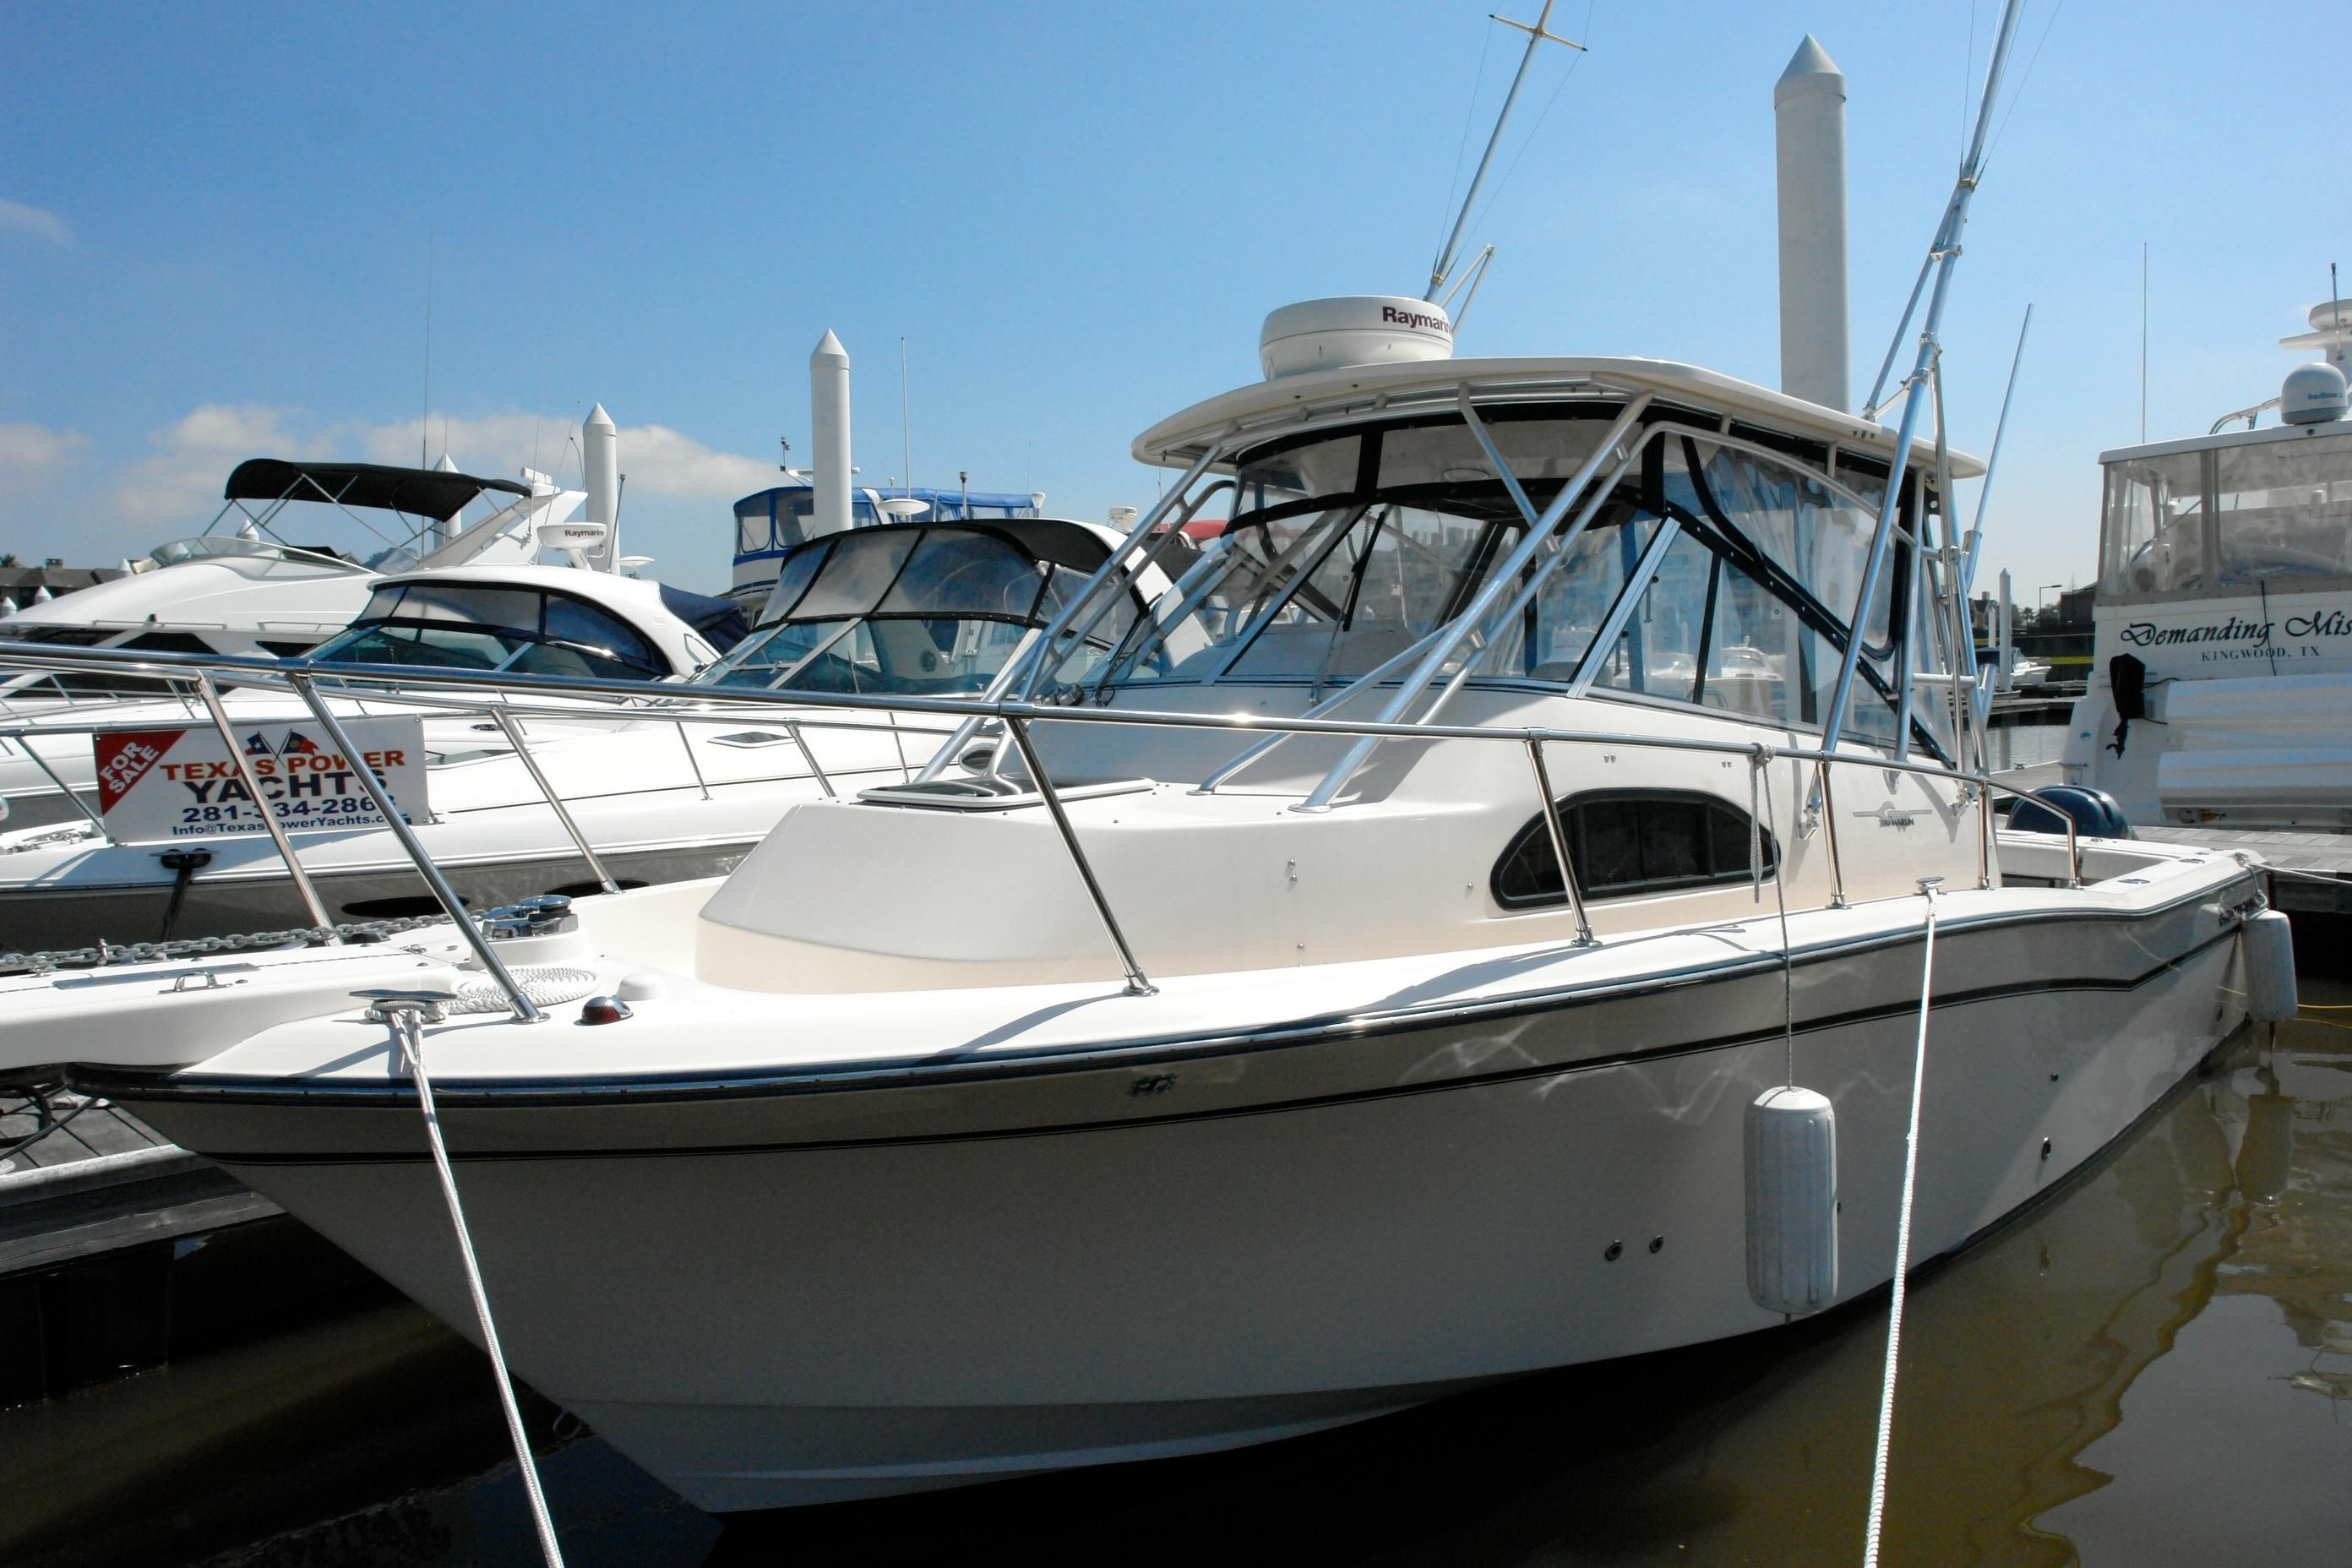 Marlin (TX) United States  city photo : 2006 Grady White Marlin 300 Power Boat For Sale www.yachtworld.com